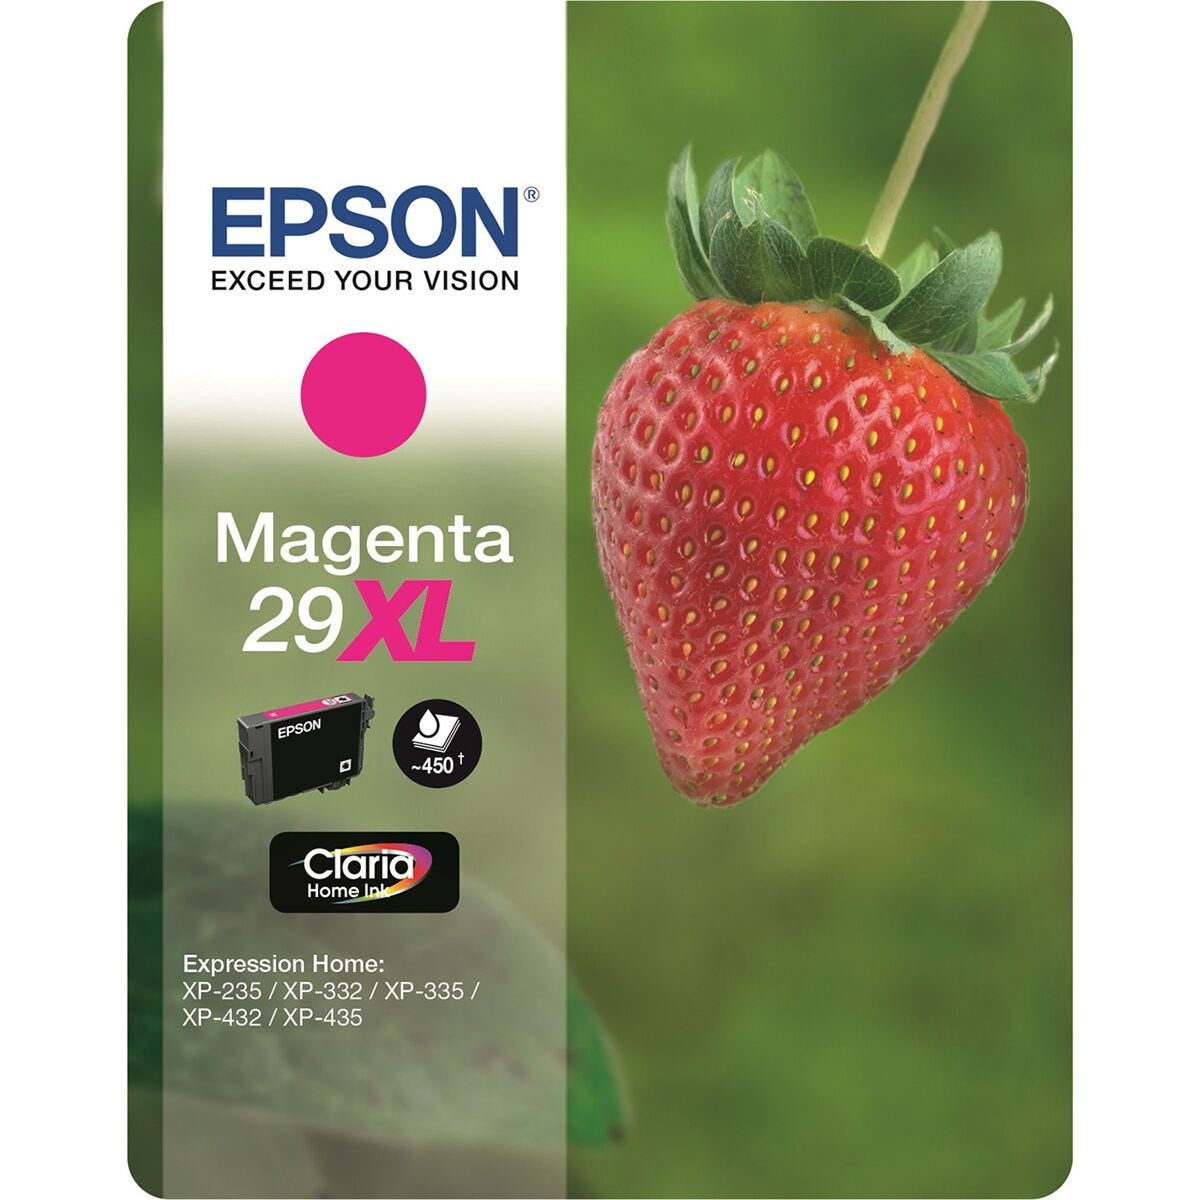 Epson 29 Strawberry Home Ink Cartridge XL Magenta